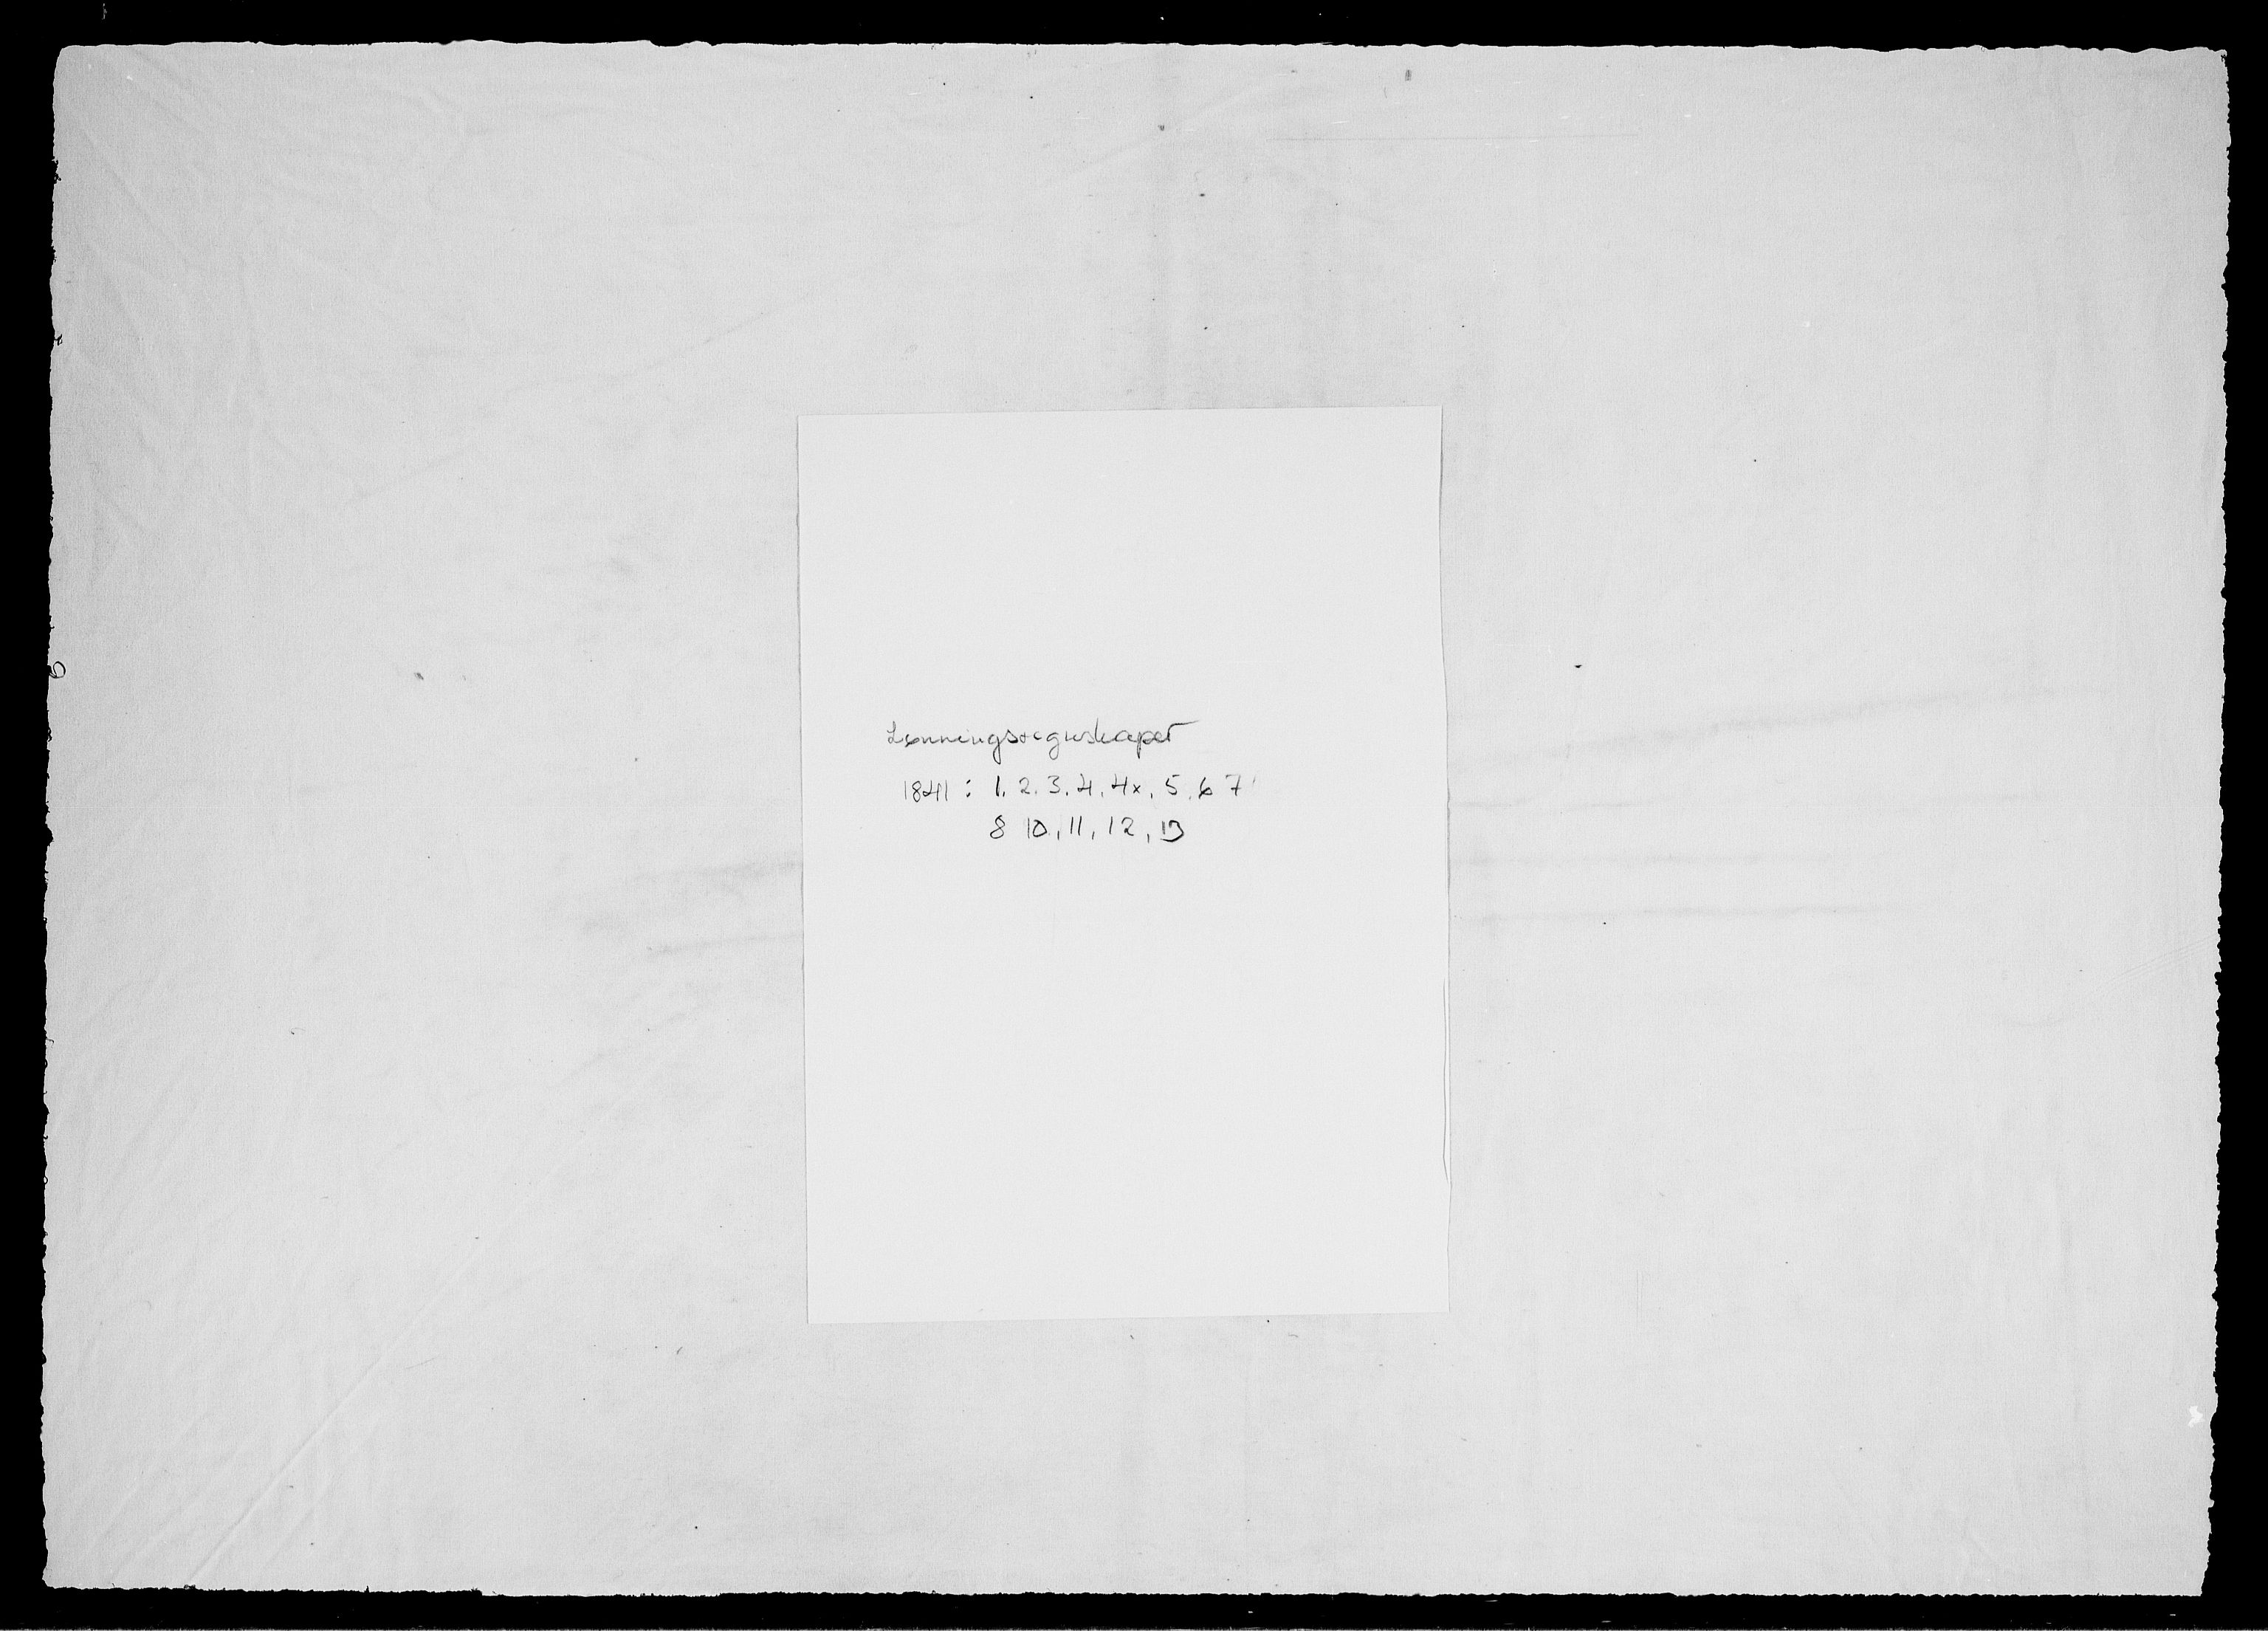 RA, Modums Blaafarveværk, G/Gd/Gdd/L0280, 1841, s. 2